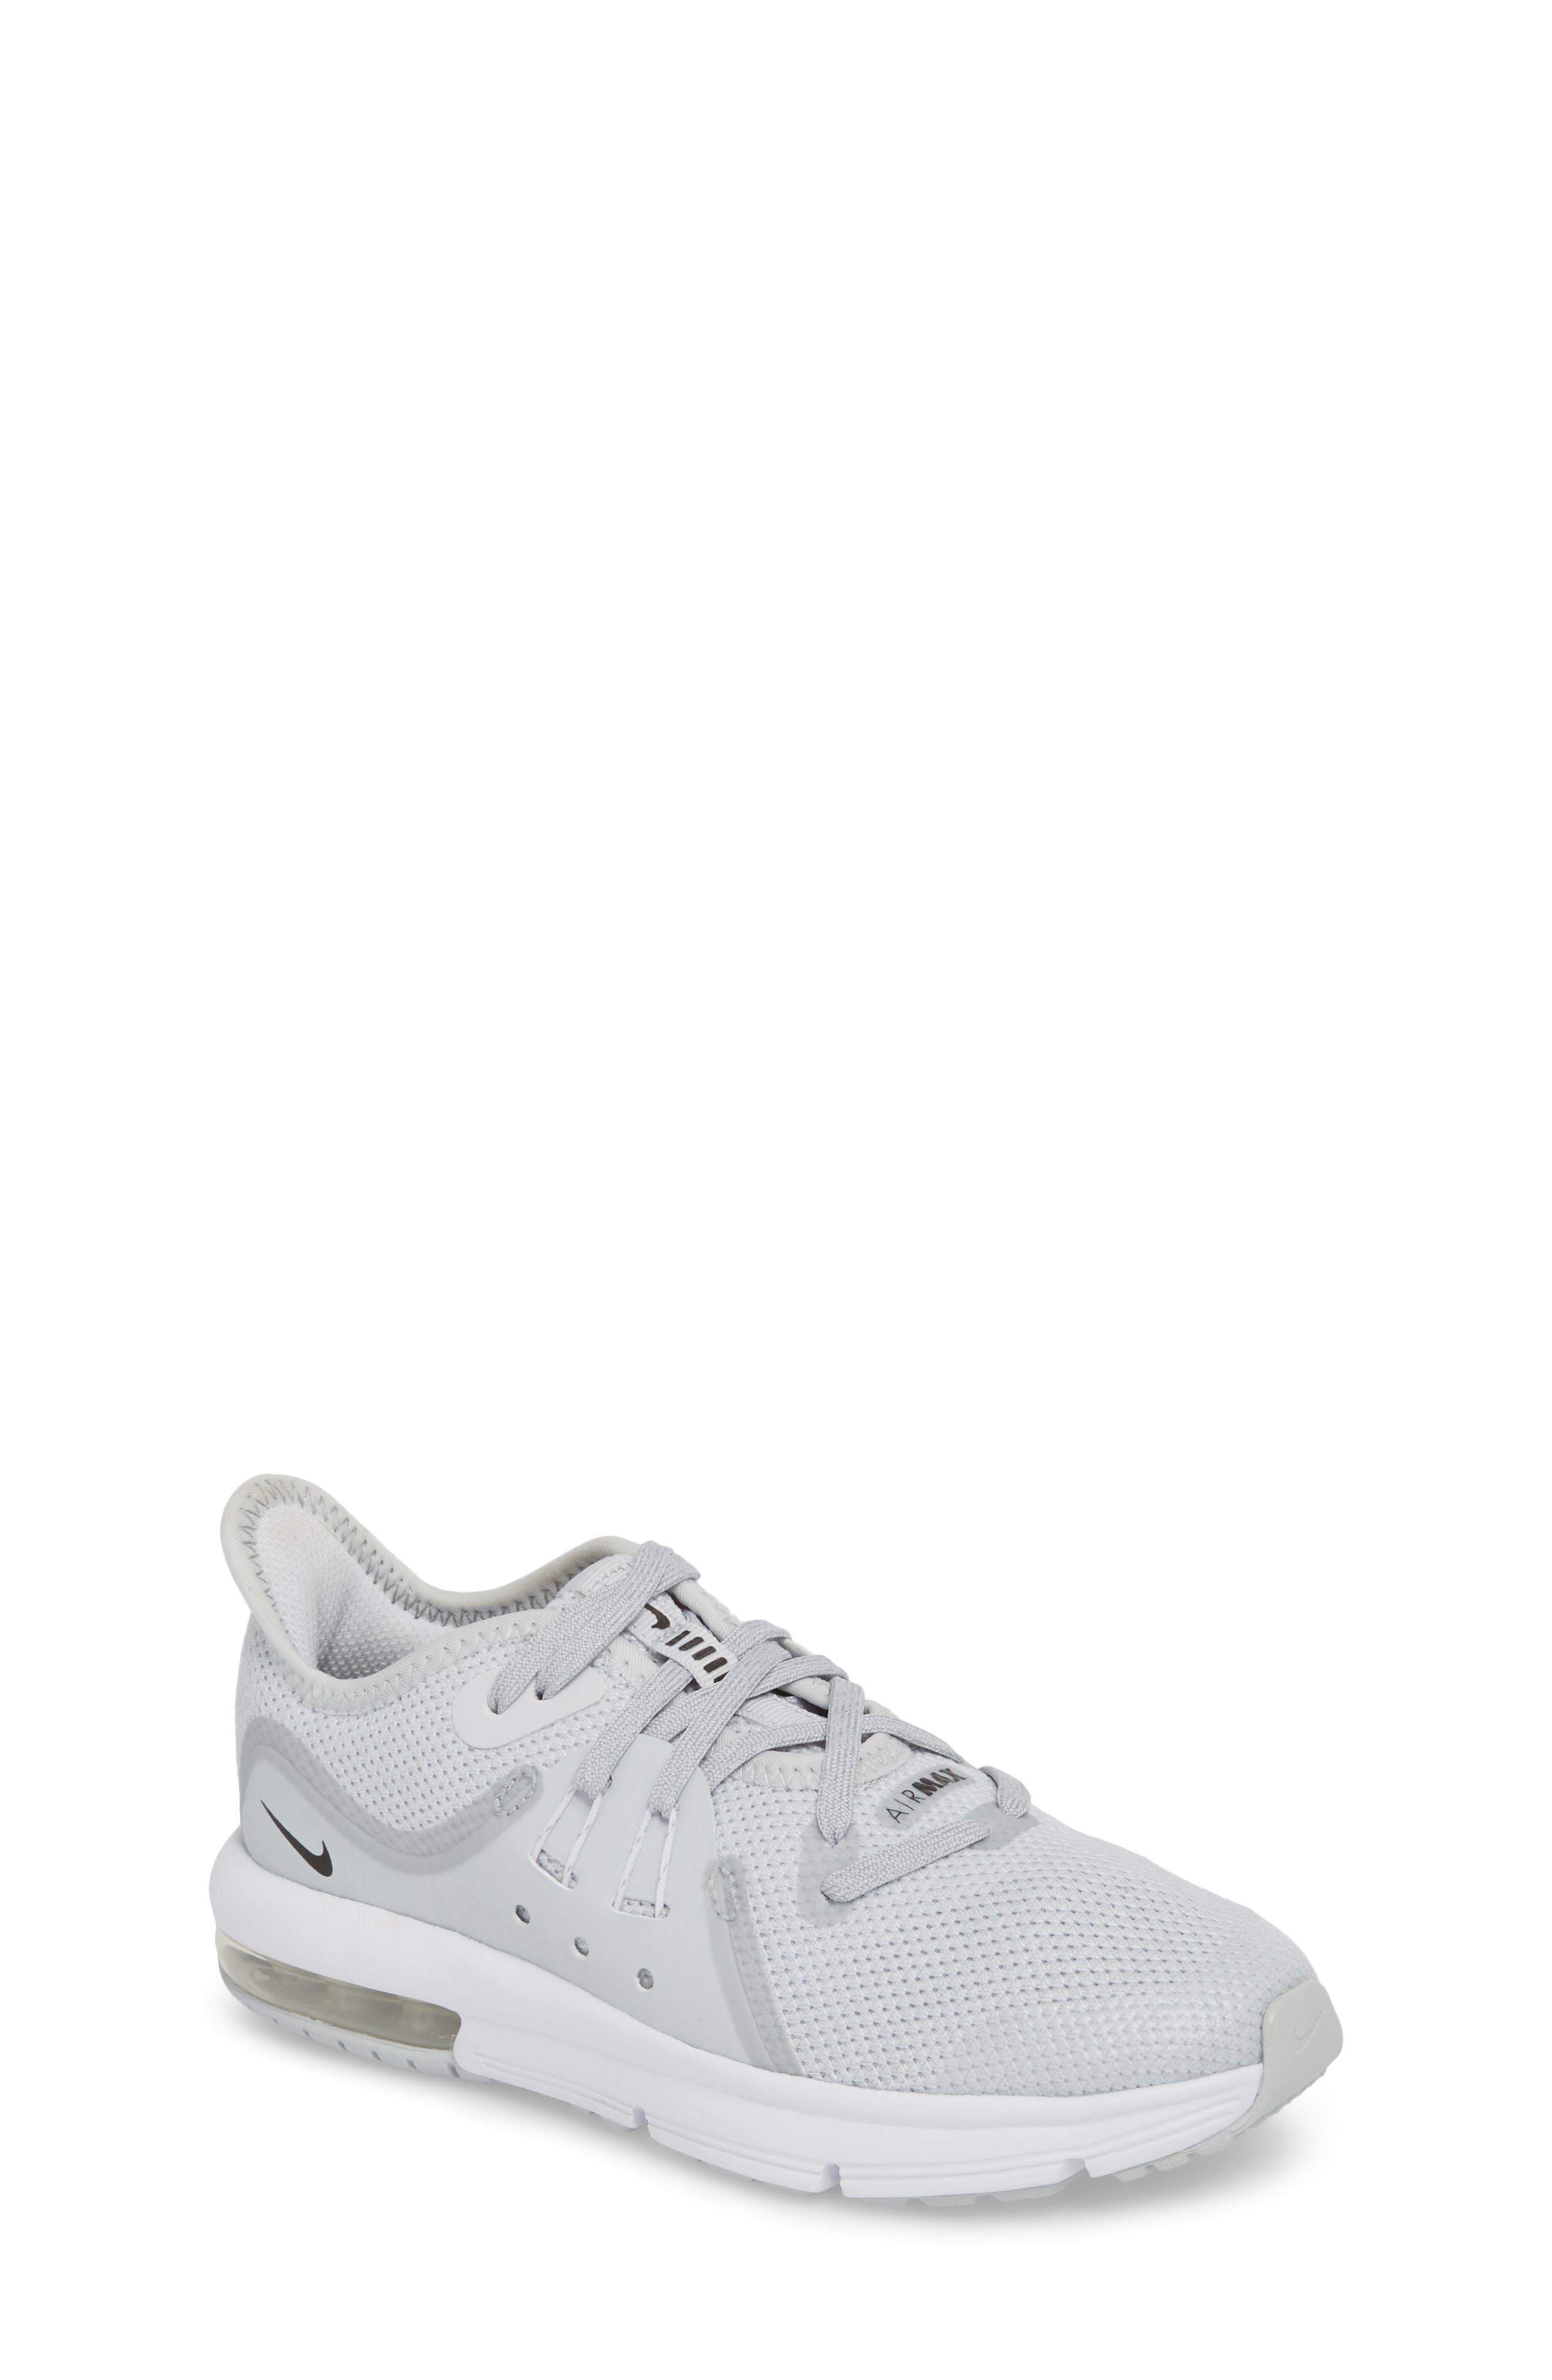 Nike Air Max Sequent 3 GS Running Shoe (Toddler, Little Kid & Big Kid) (Regular Retail Price: $80.00)